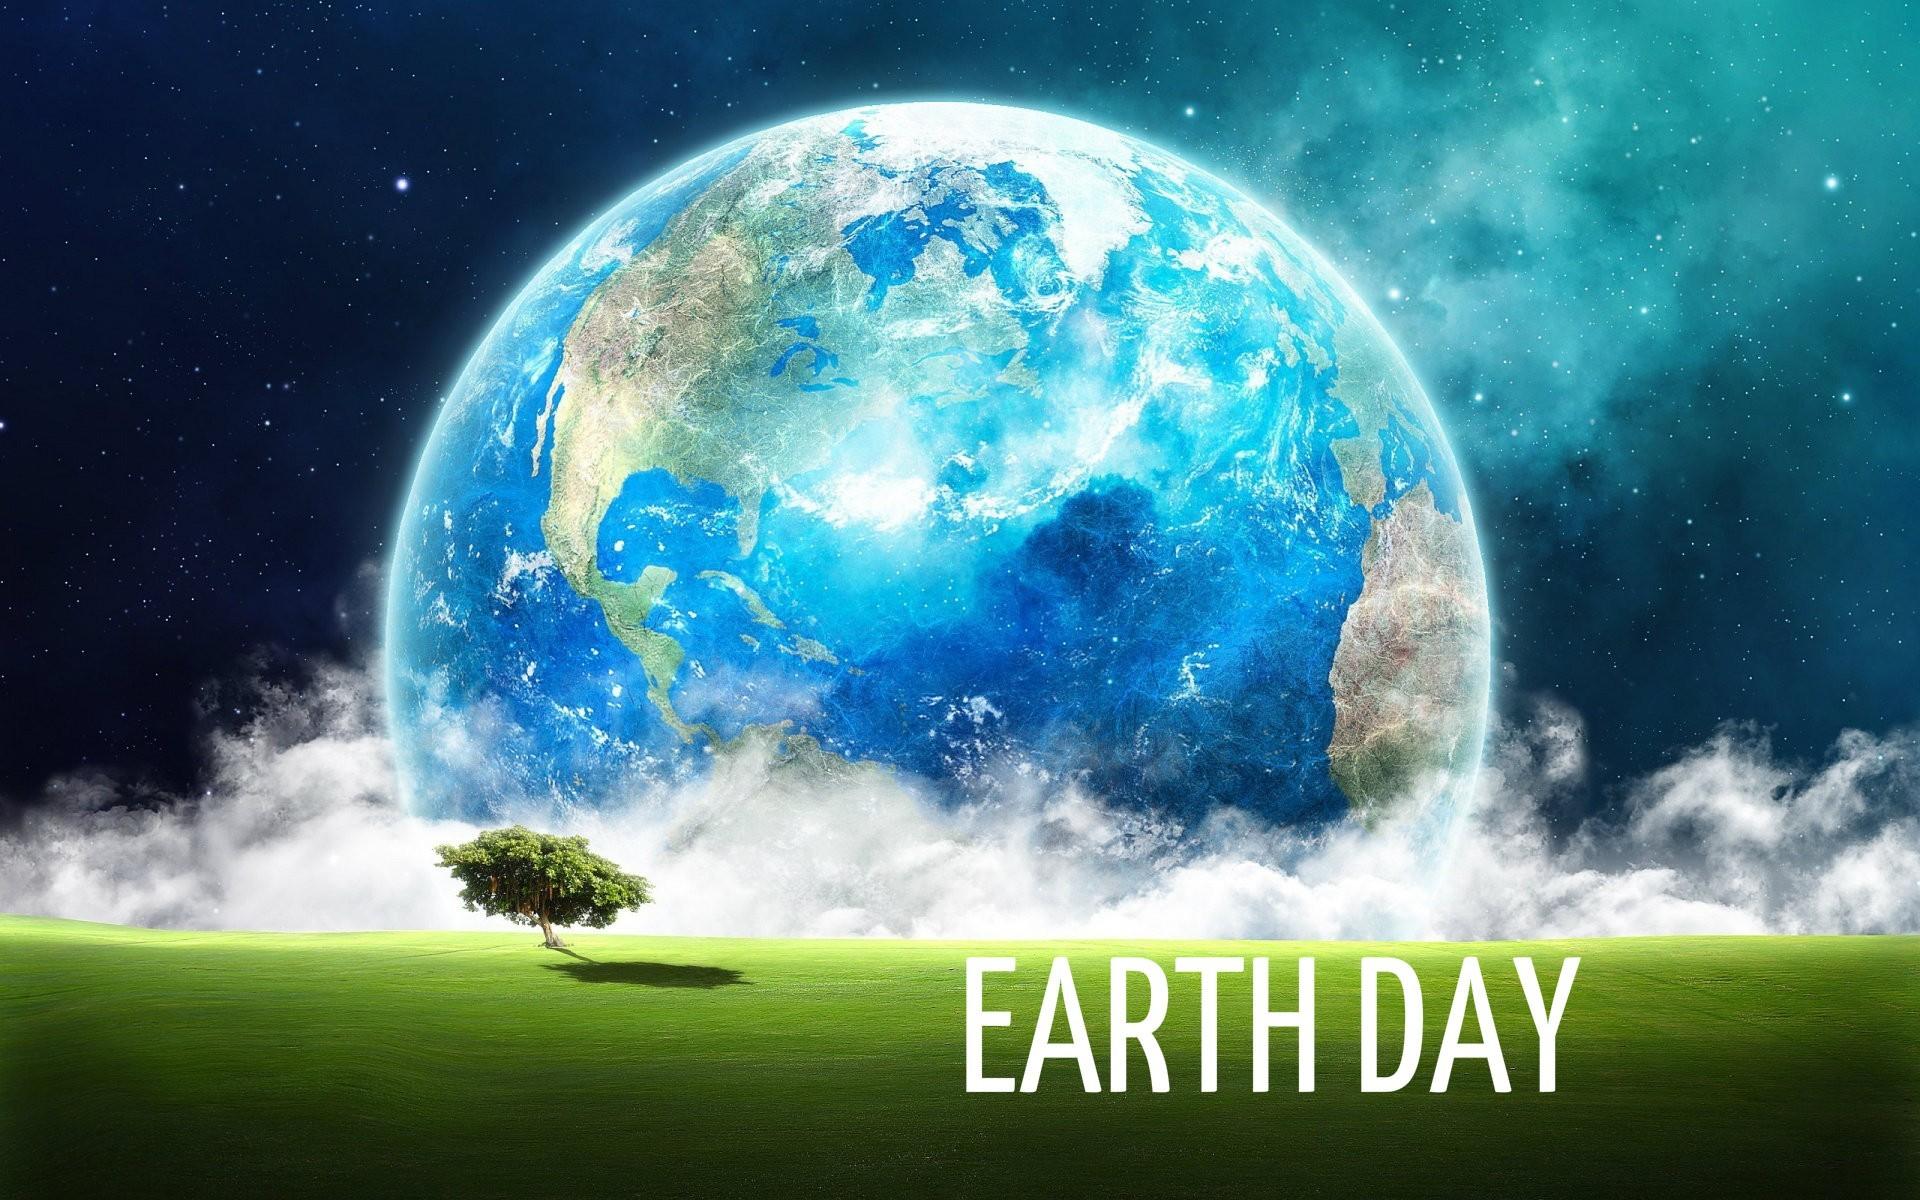 Earth Day Hd Wallpaper   KoLPaPer   Awesome HD Wallpapers 1920x1200